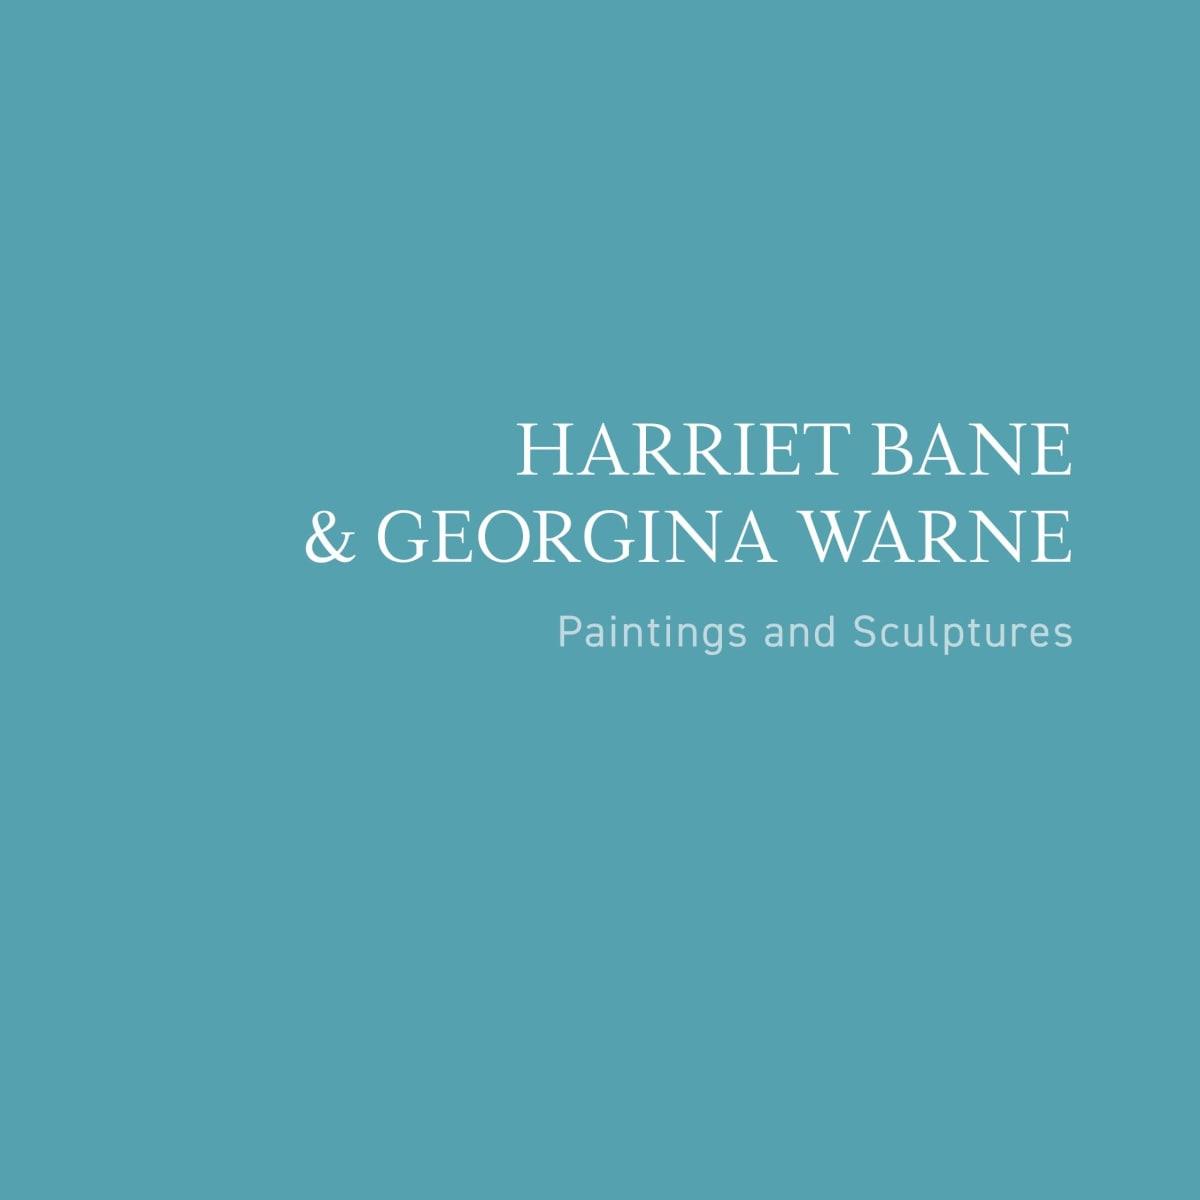 Harriet Bane and Georgina Warne: Paintings & Sculptures